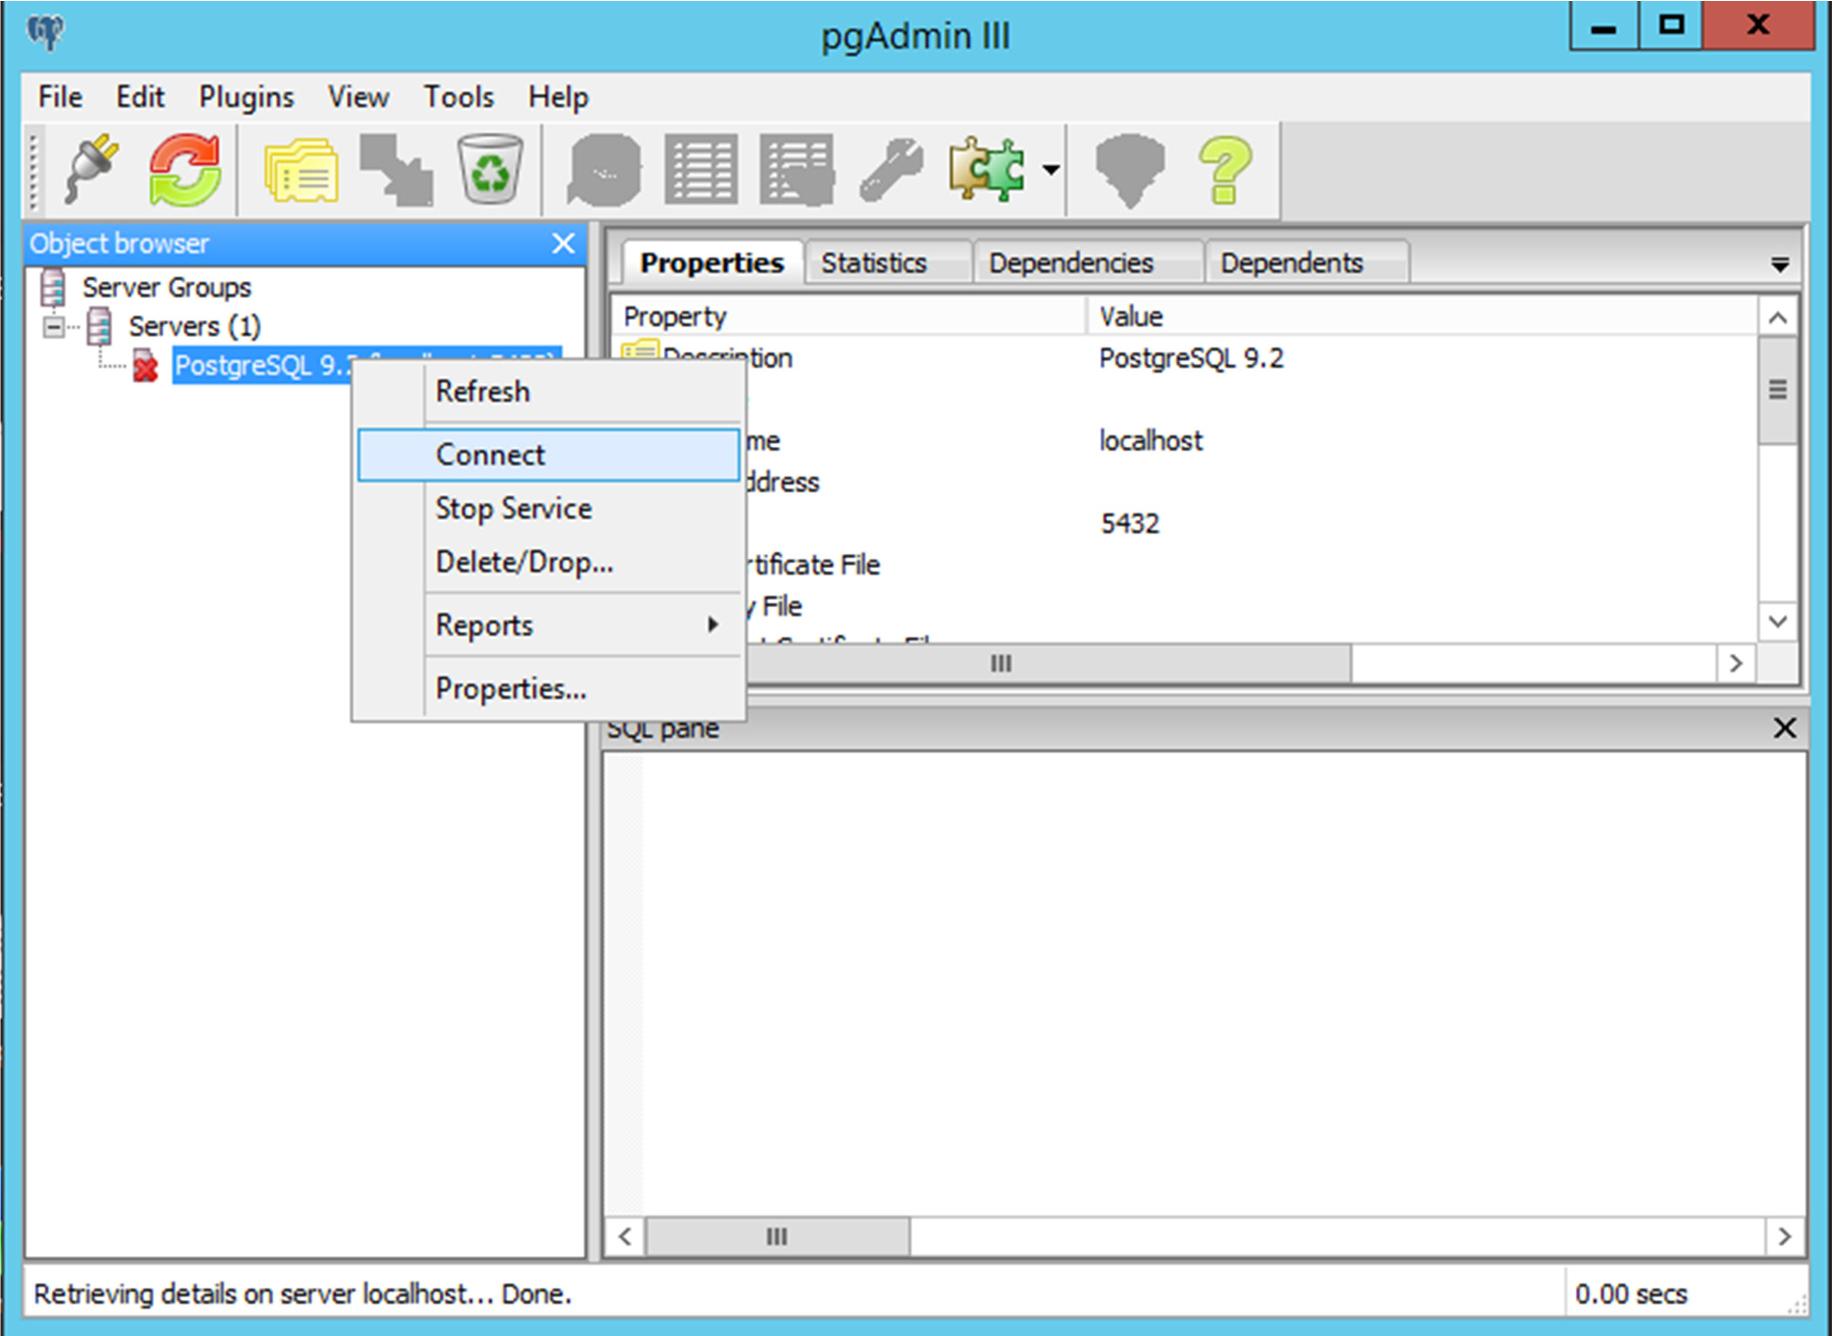 KB_160049: Create a PostgreSQL user for backups